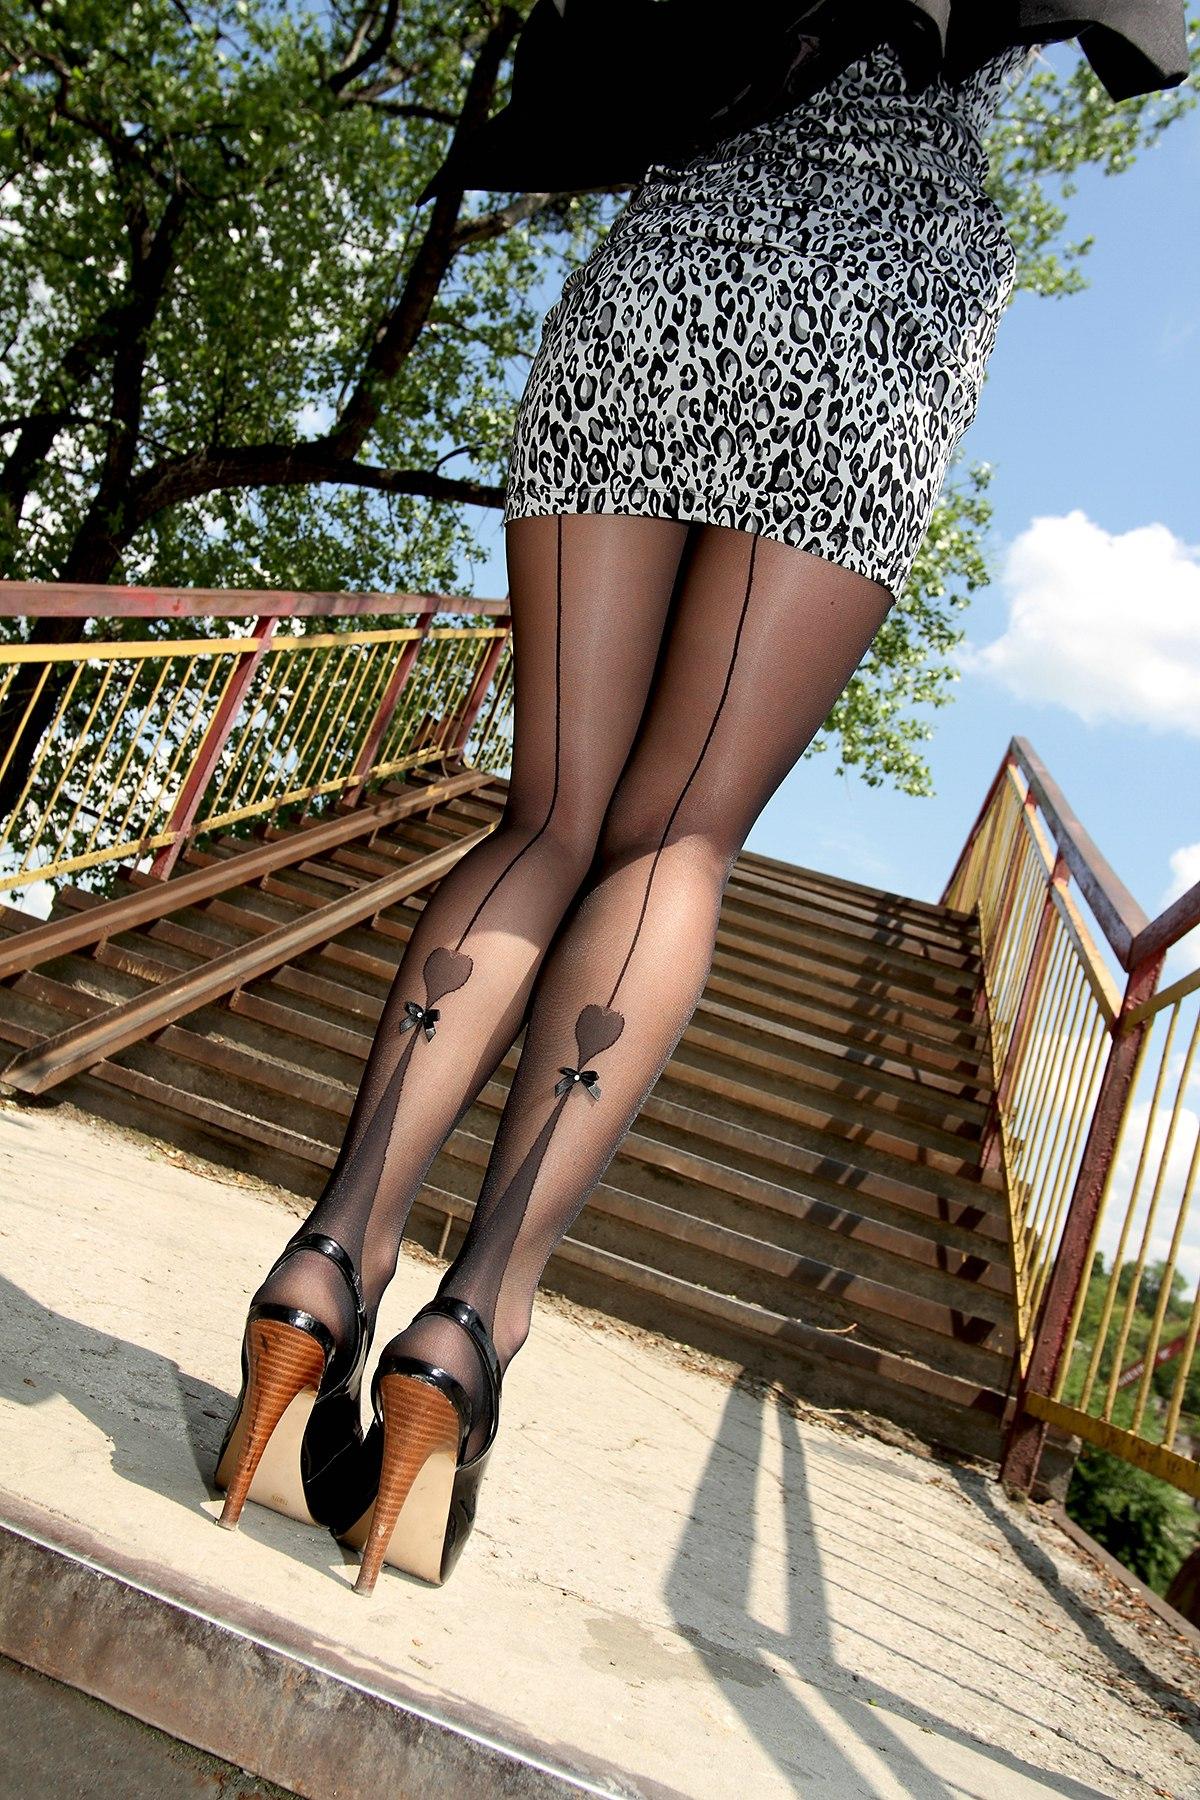 Строиненькие ножки юбки фото 22 фотография